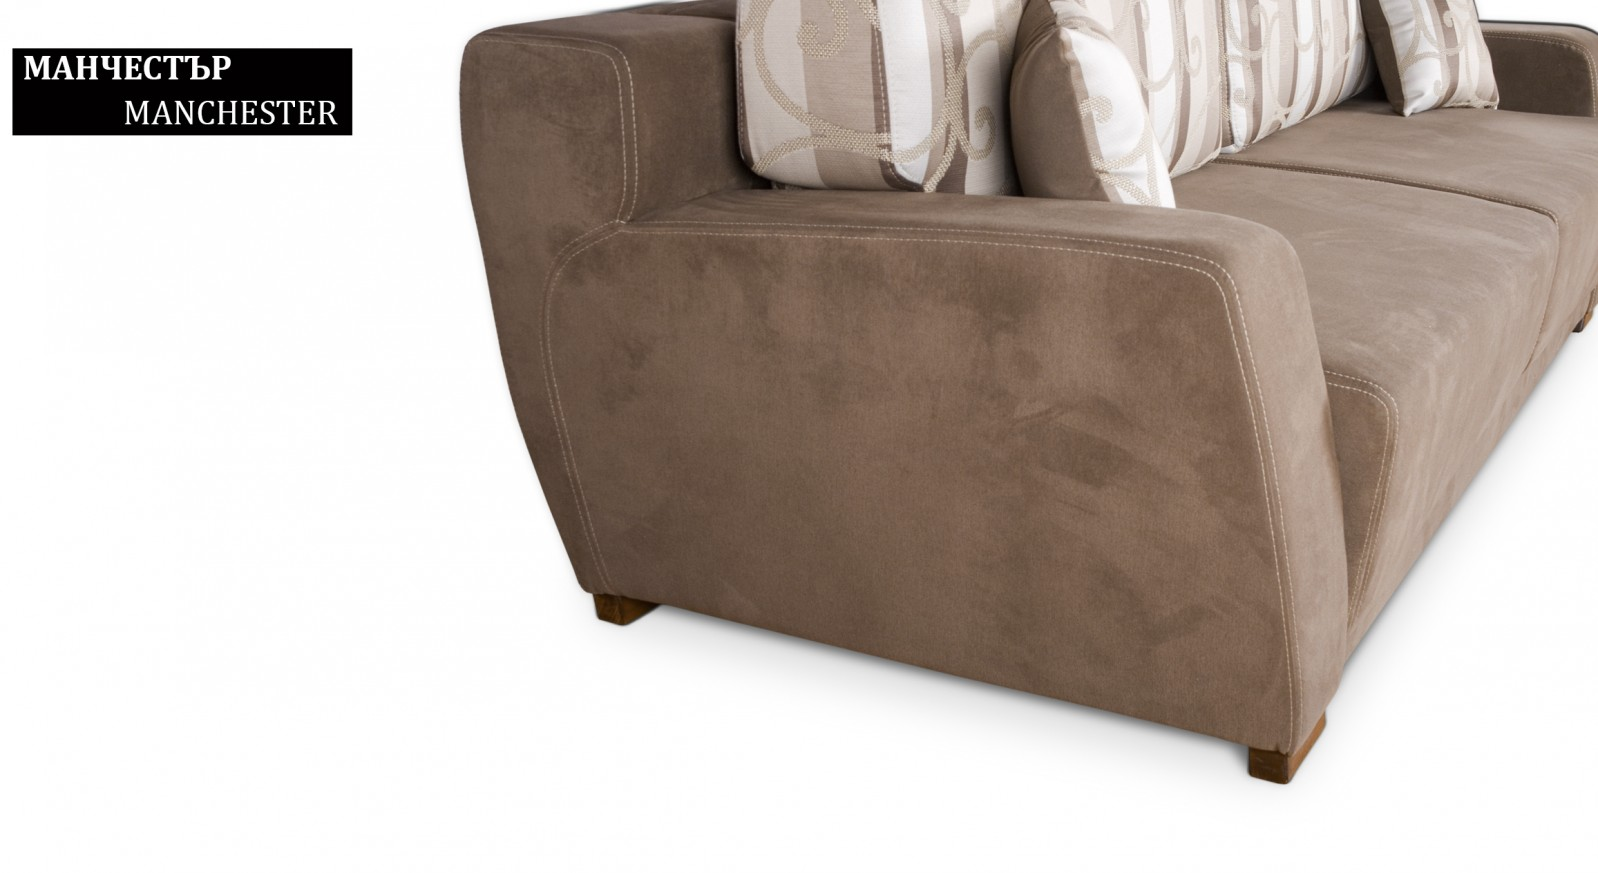 Sofa Manchester Standard Sofas By Rudi An